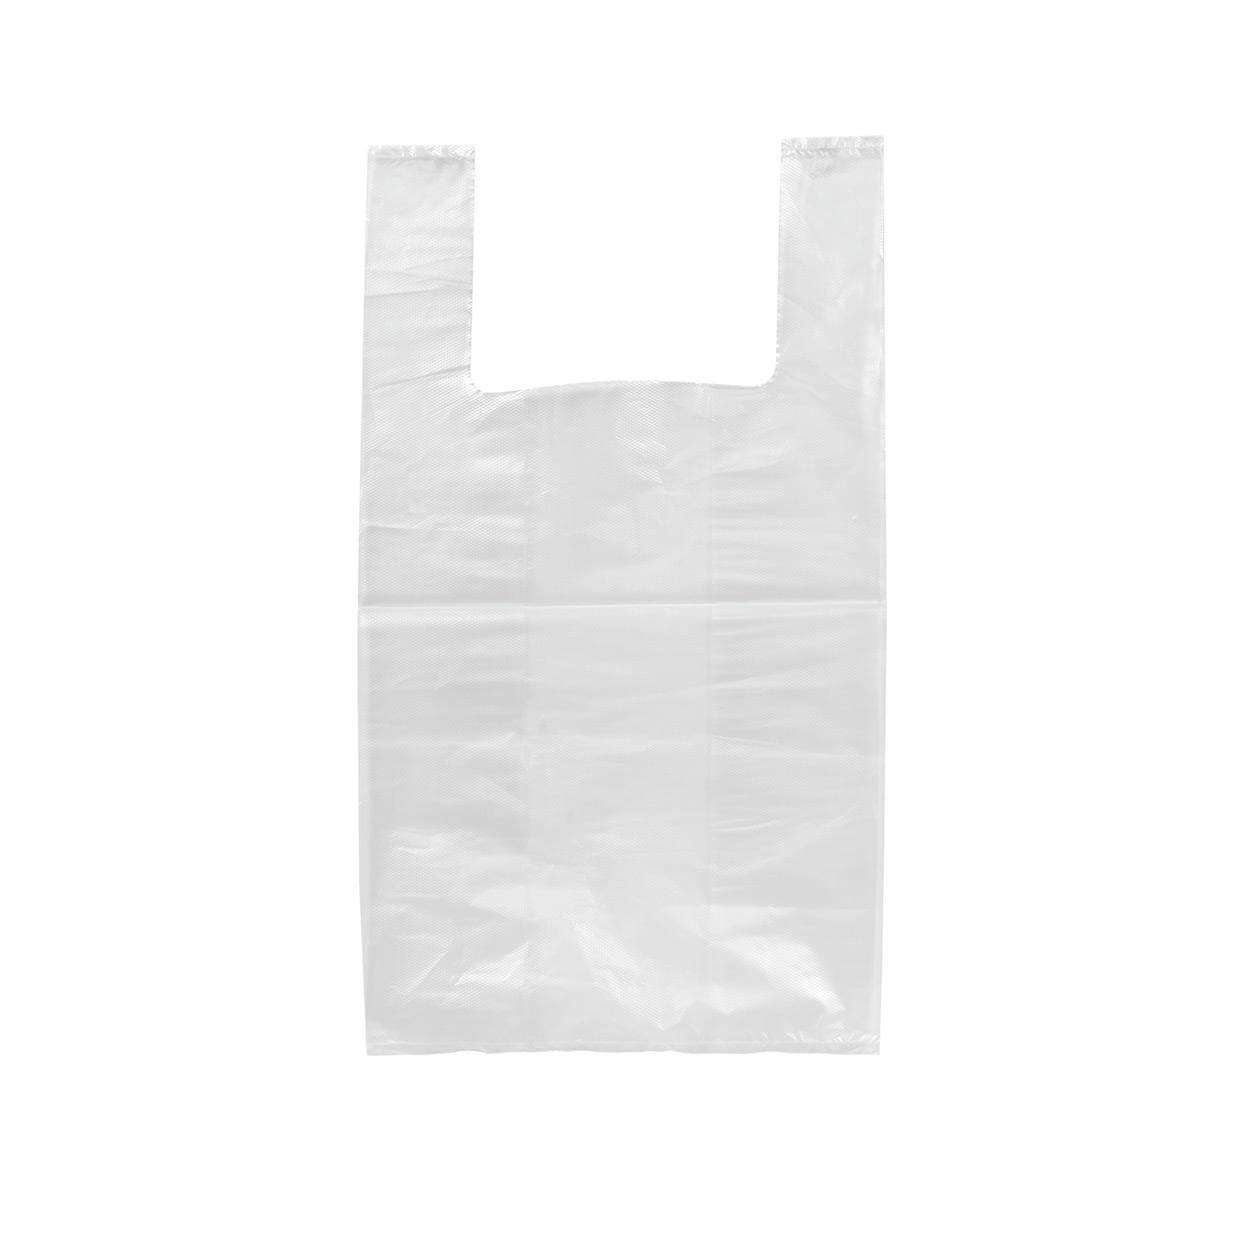 Singlet Plastic Bag (1)